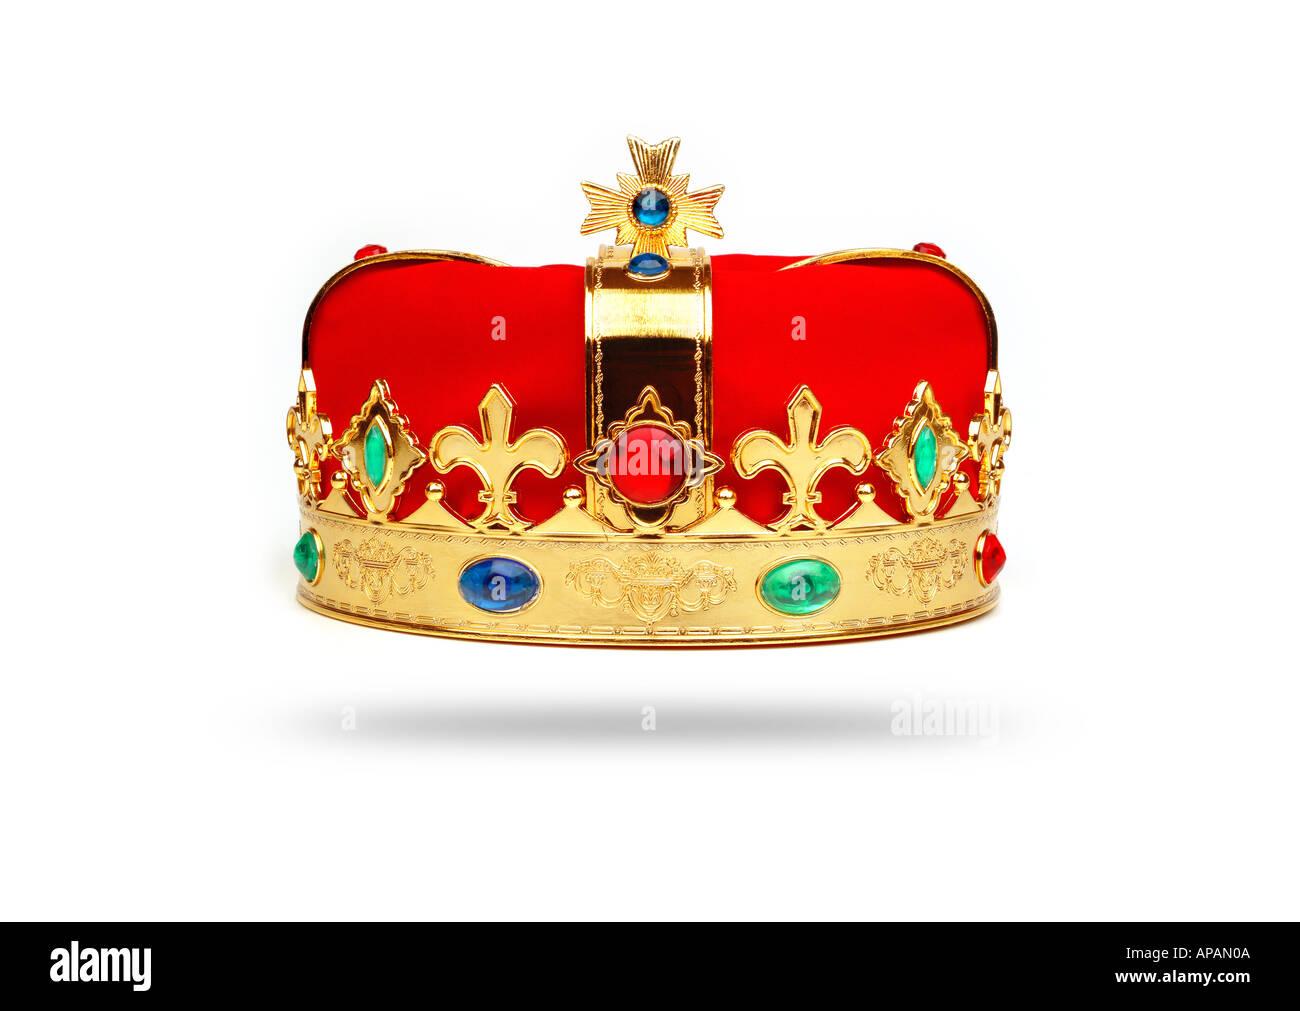 crown Krone - Stock Image